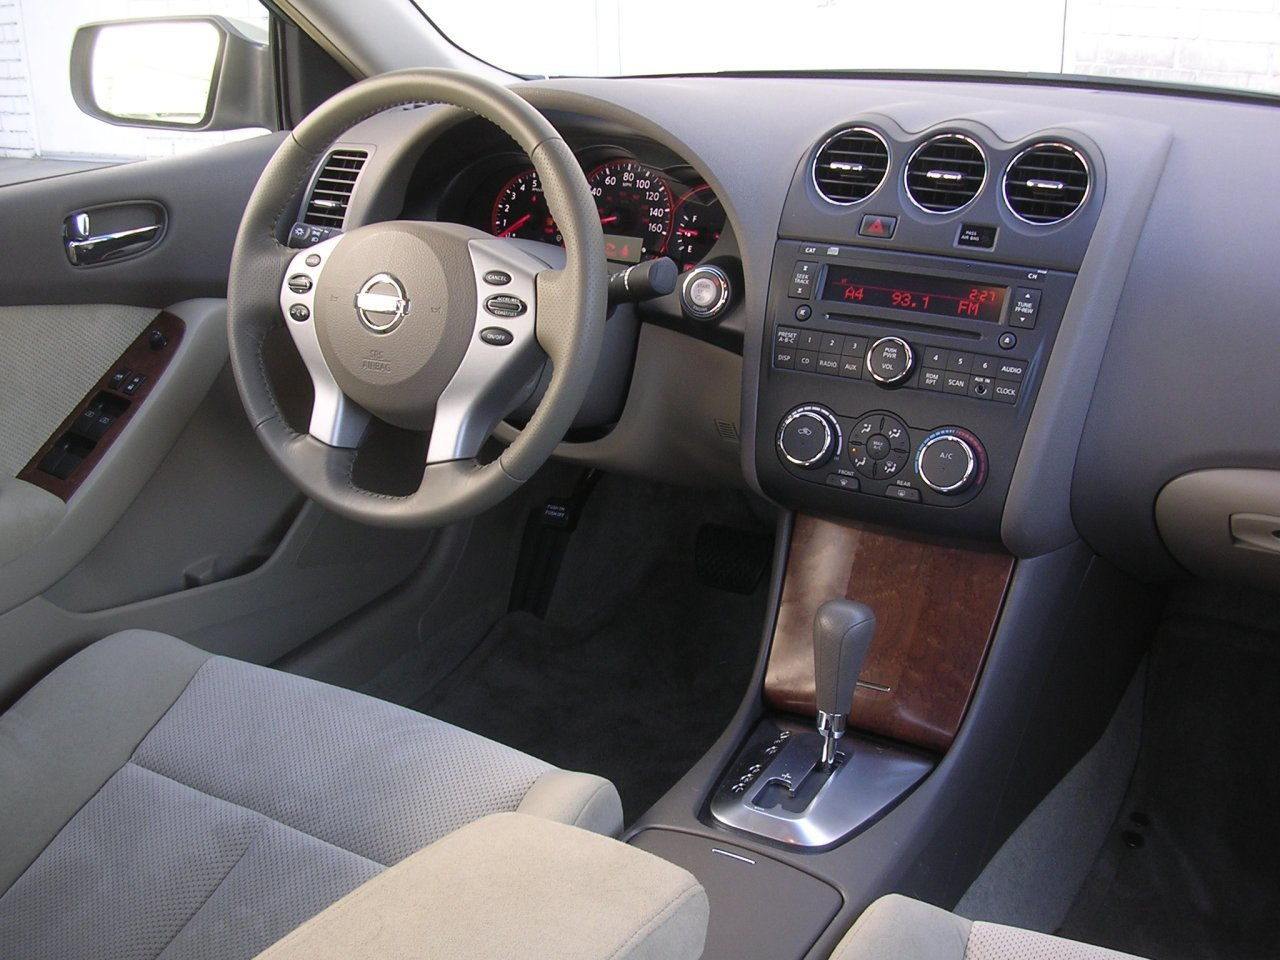 2007 nissan altima image 10 2005 nissan altima custom interior